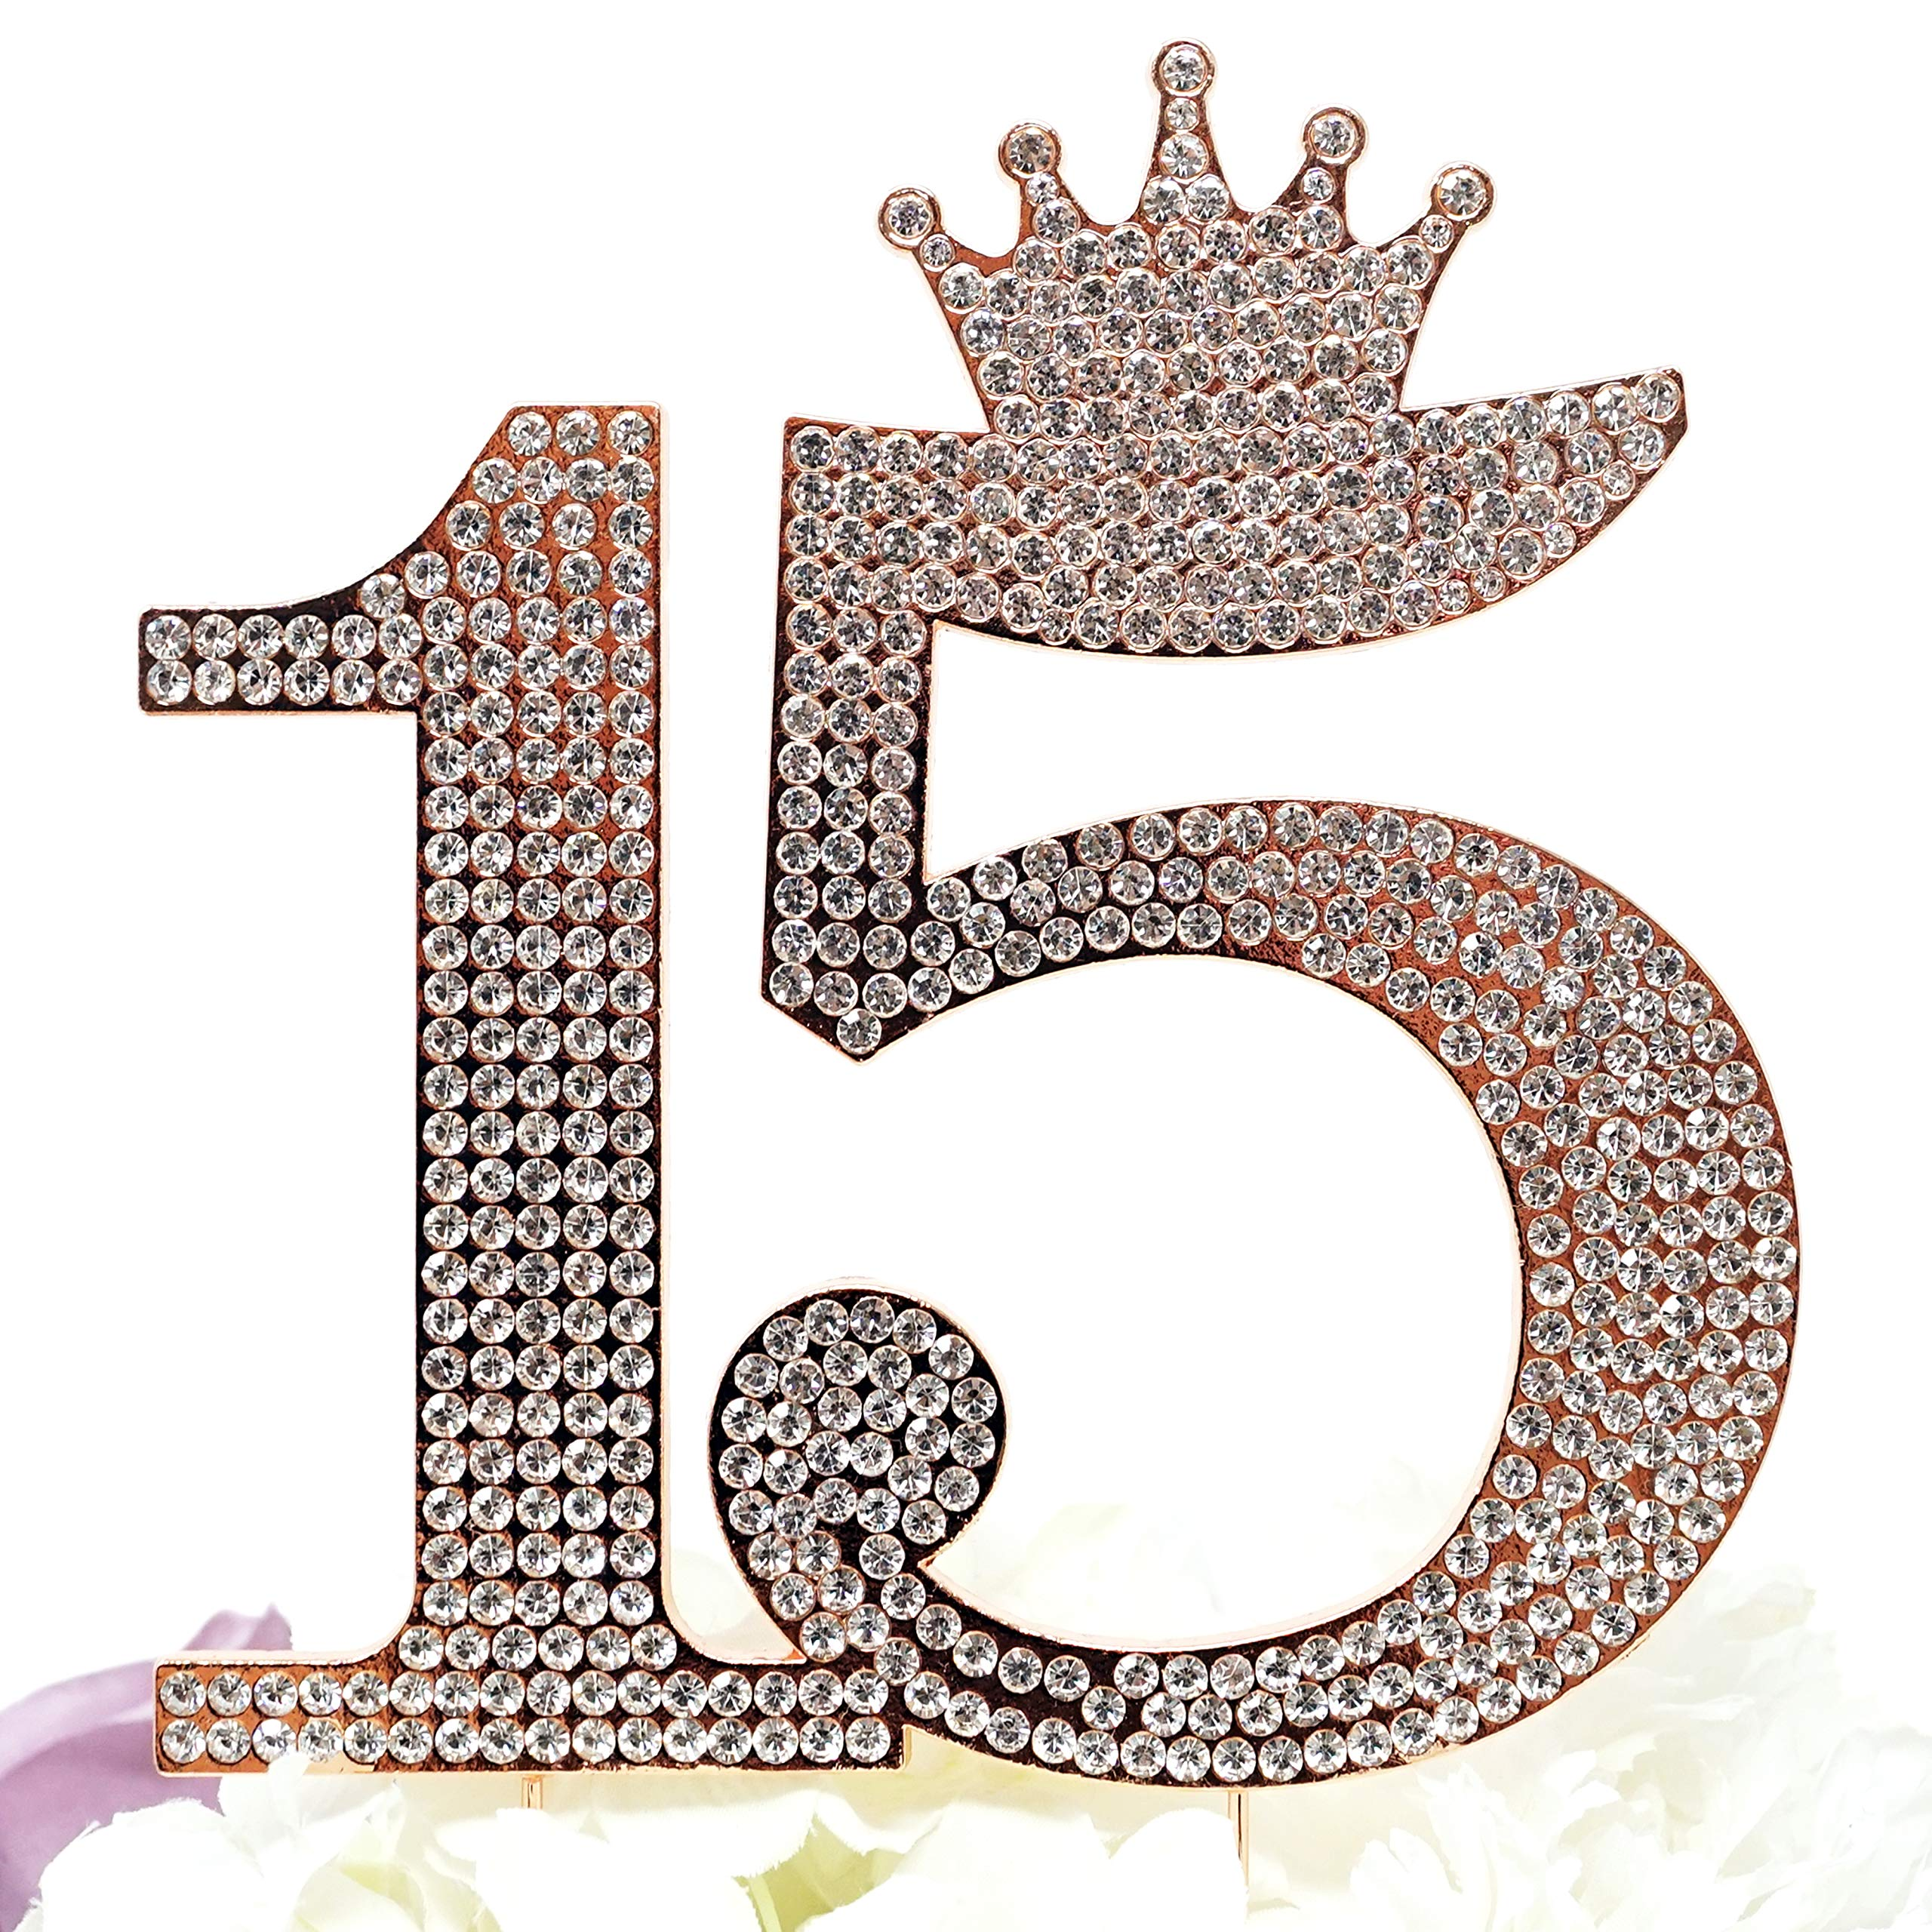 Number 15 Quinceanera Rhinestone Princess Crown Monogram Cake Topper - Sweet 15th Birthday Party (Rose Gold) by Chloe Elizabeth